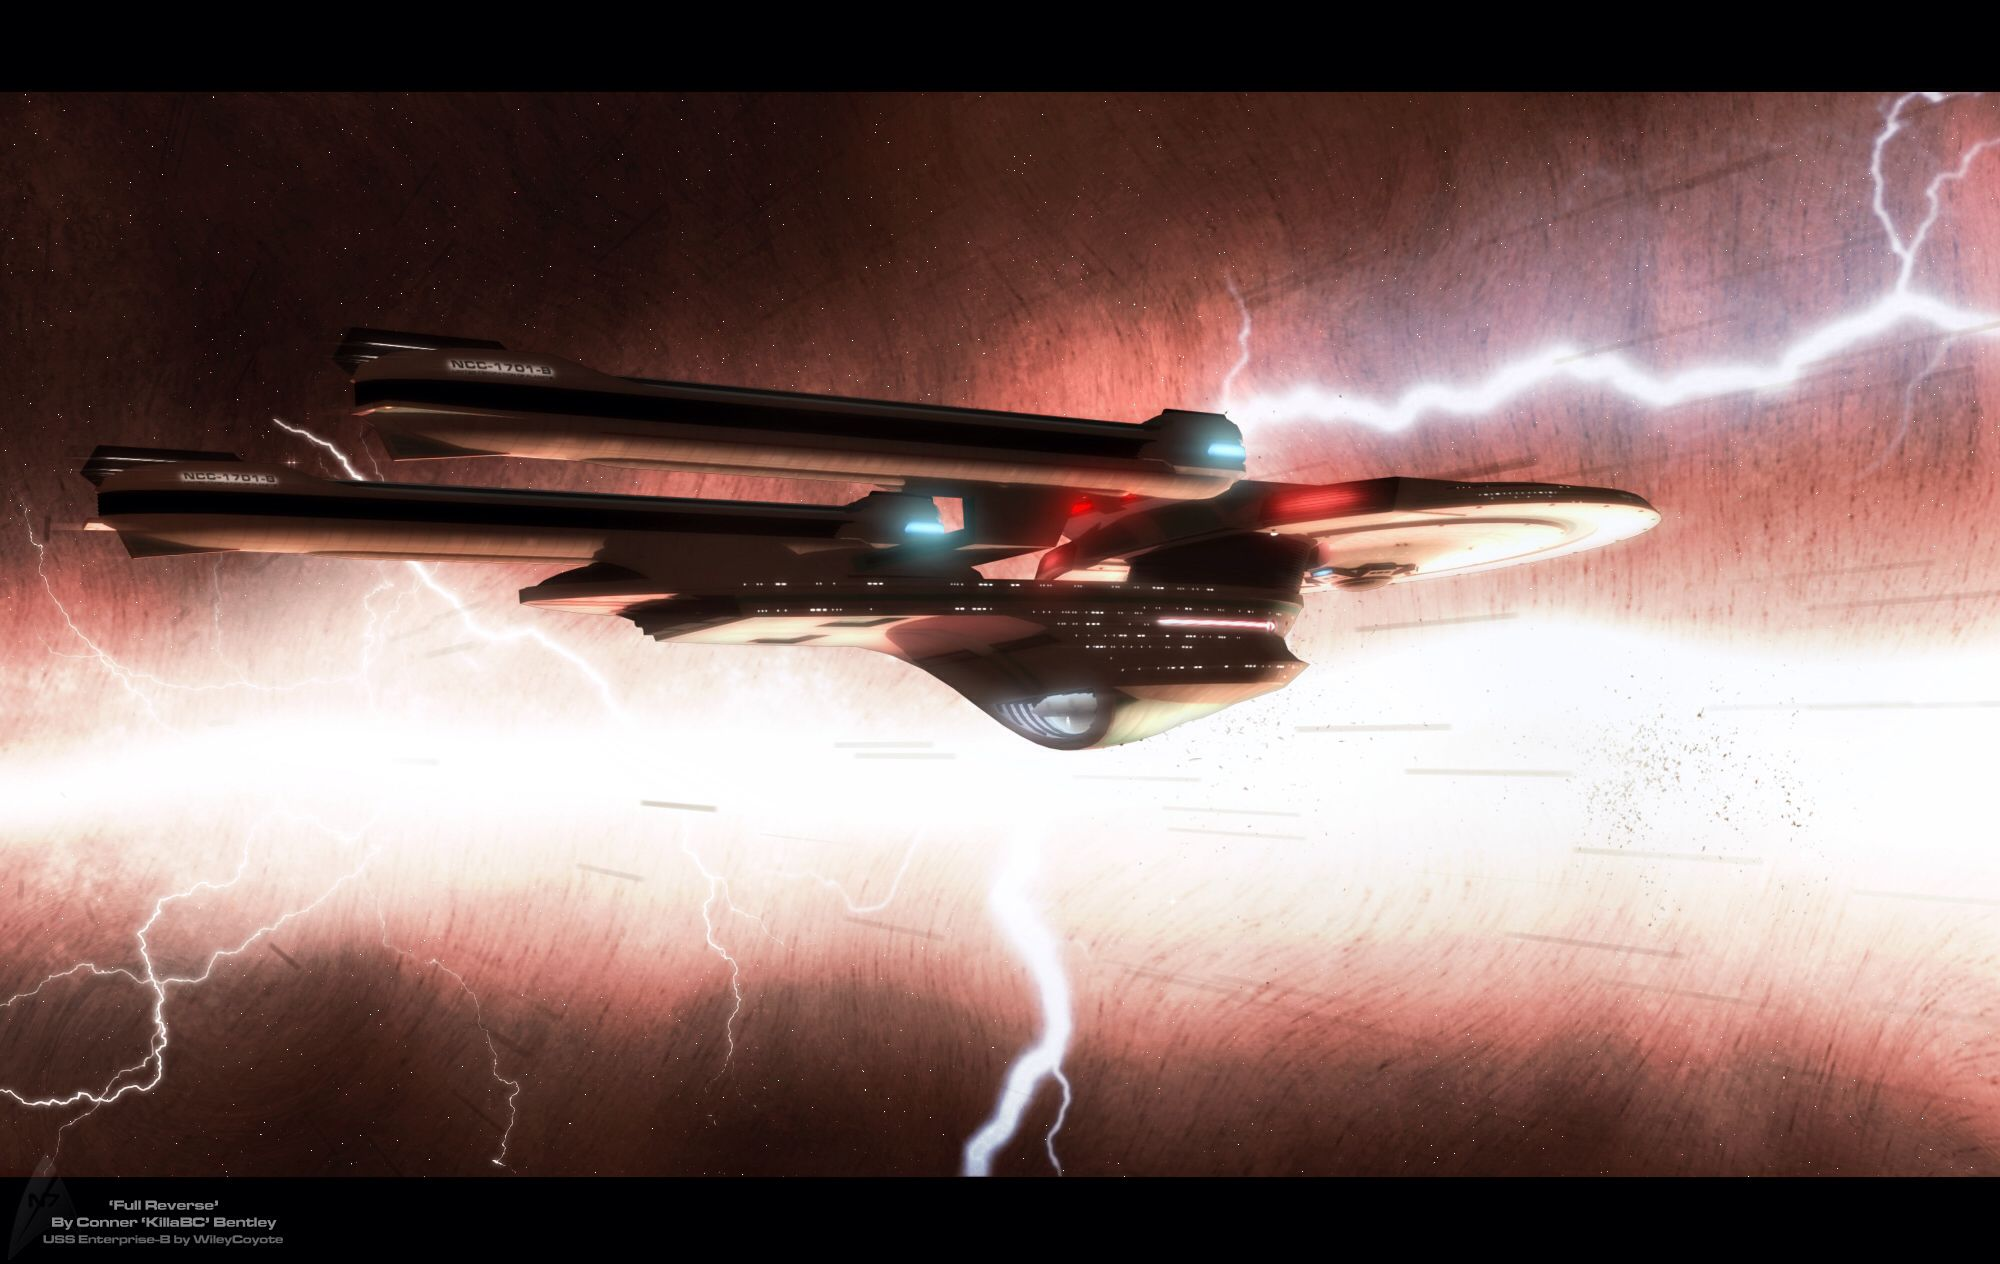 Uss enterprise ncc 1701 d galaxy class saucer separation r flickr - Uss Enterprise Ncc 1701 B